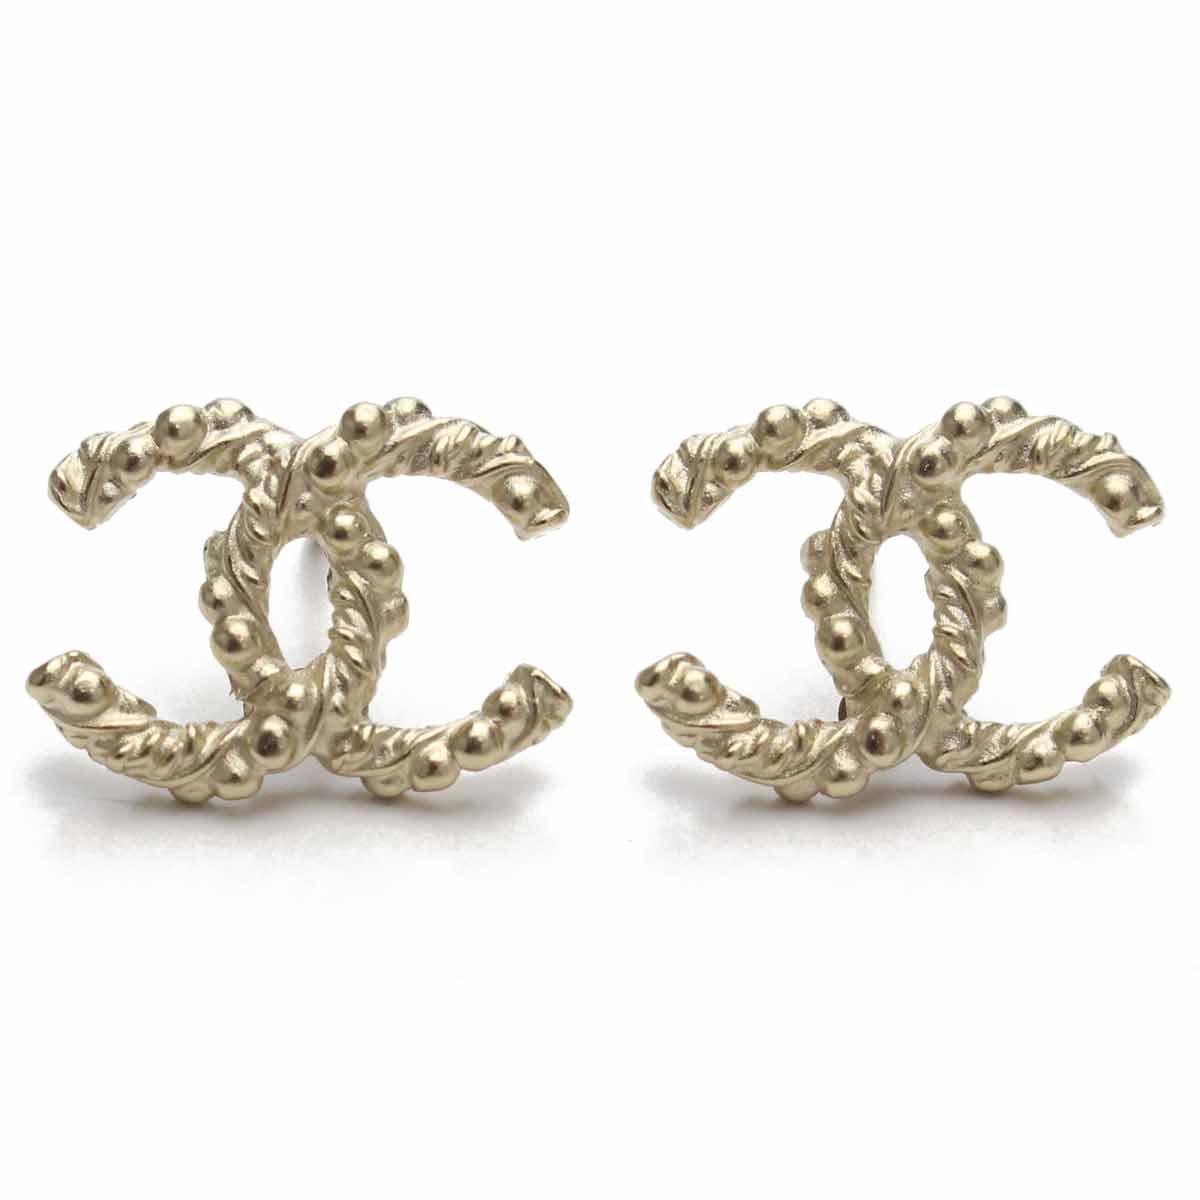 Chanel (CHANEL) here mark pierced earrings A95900 gold system